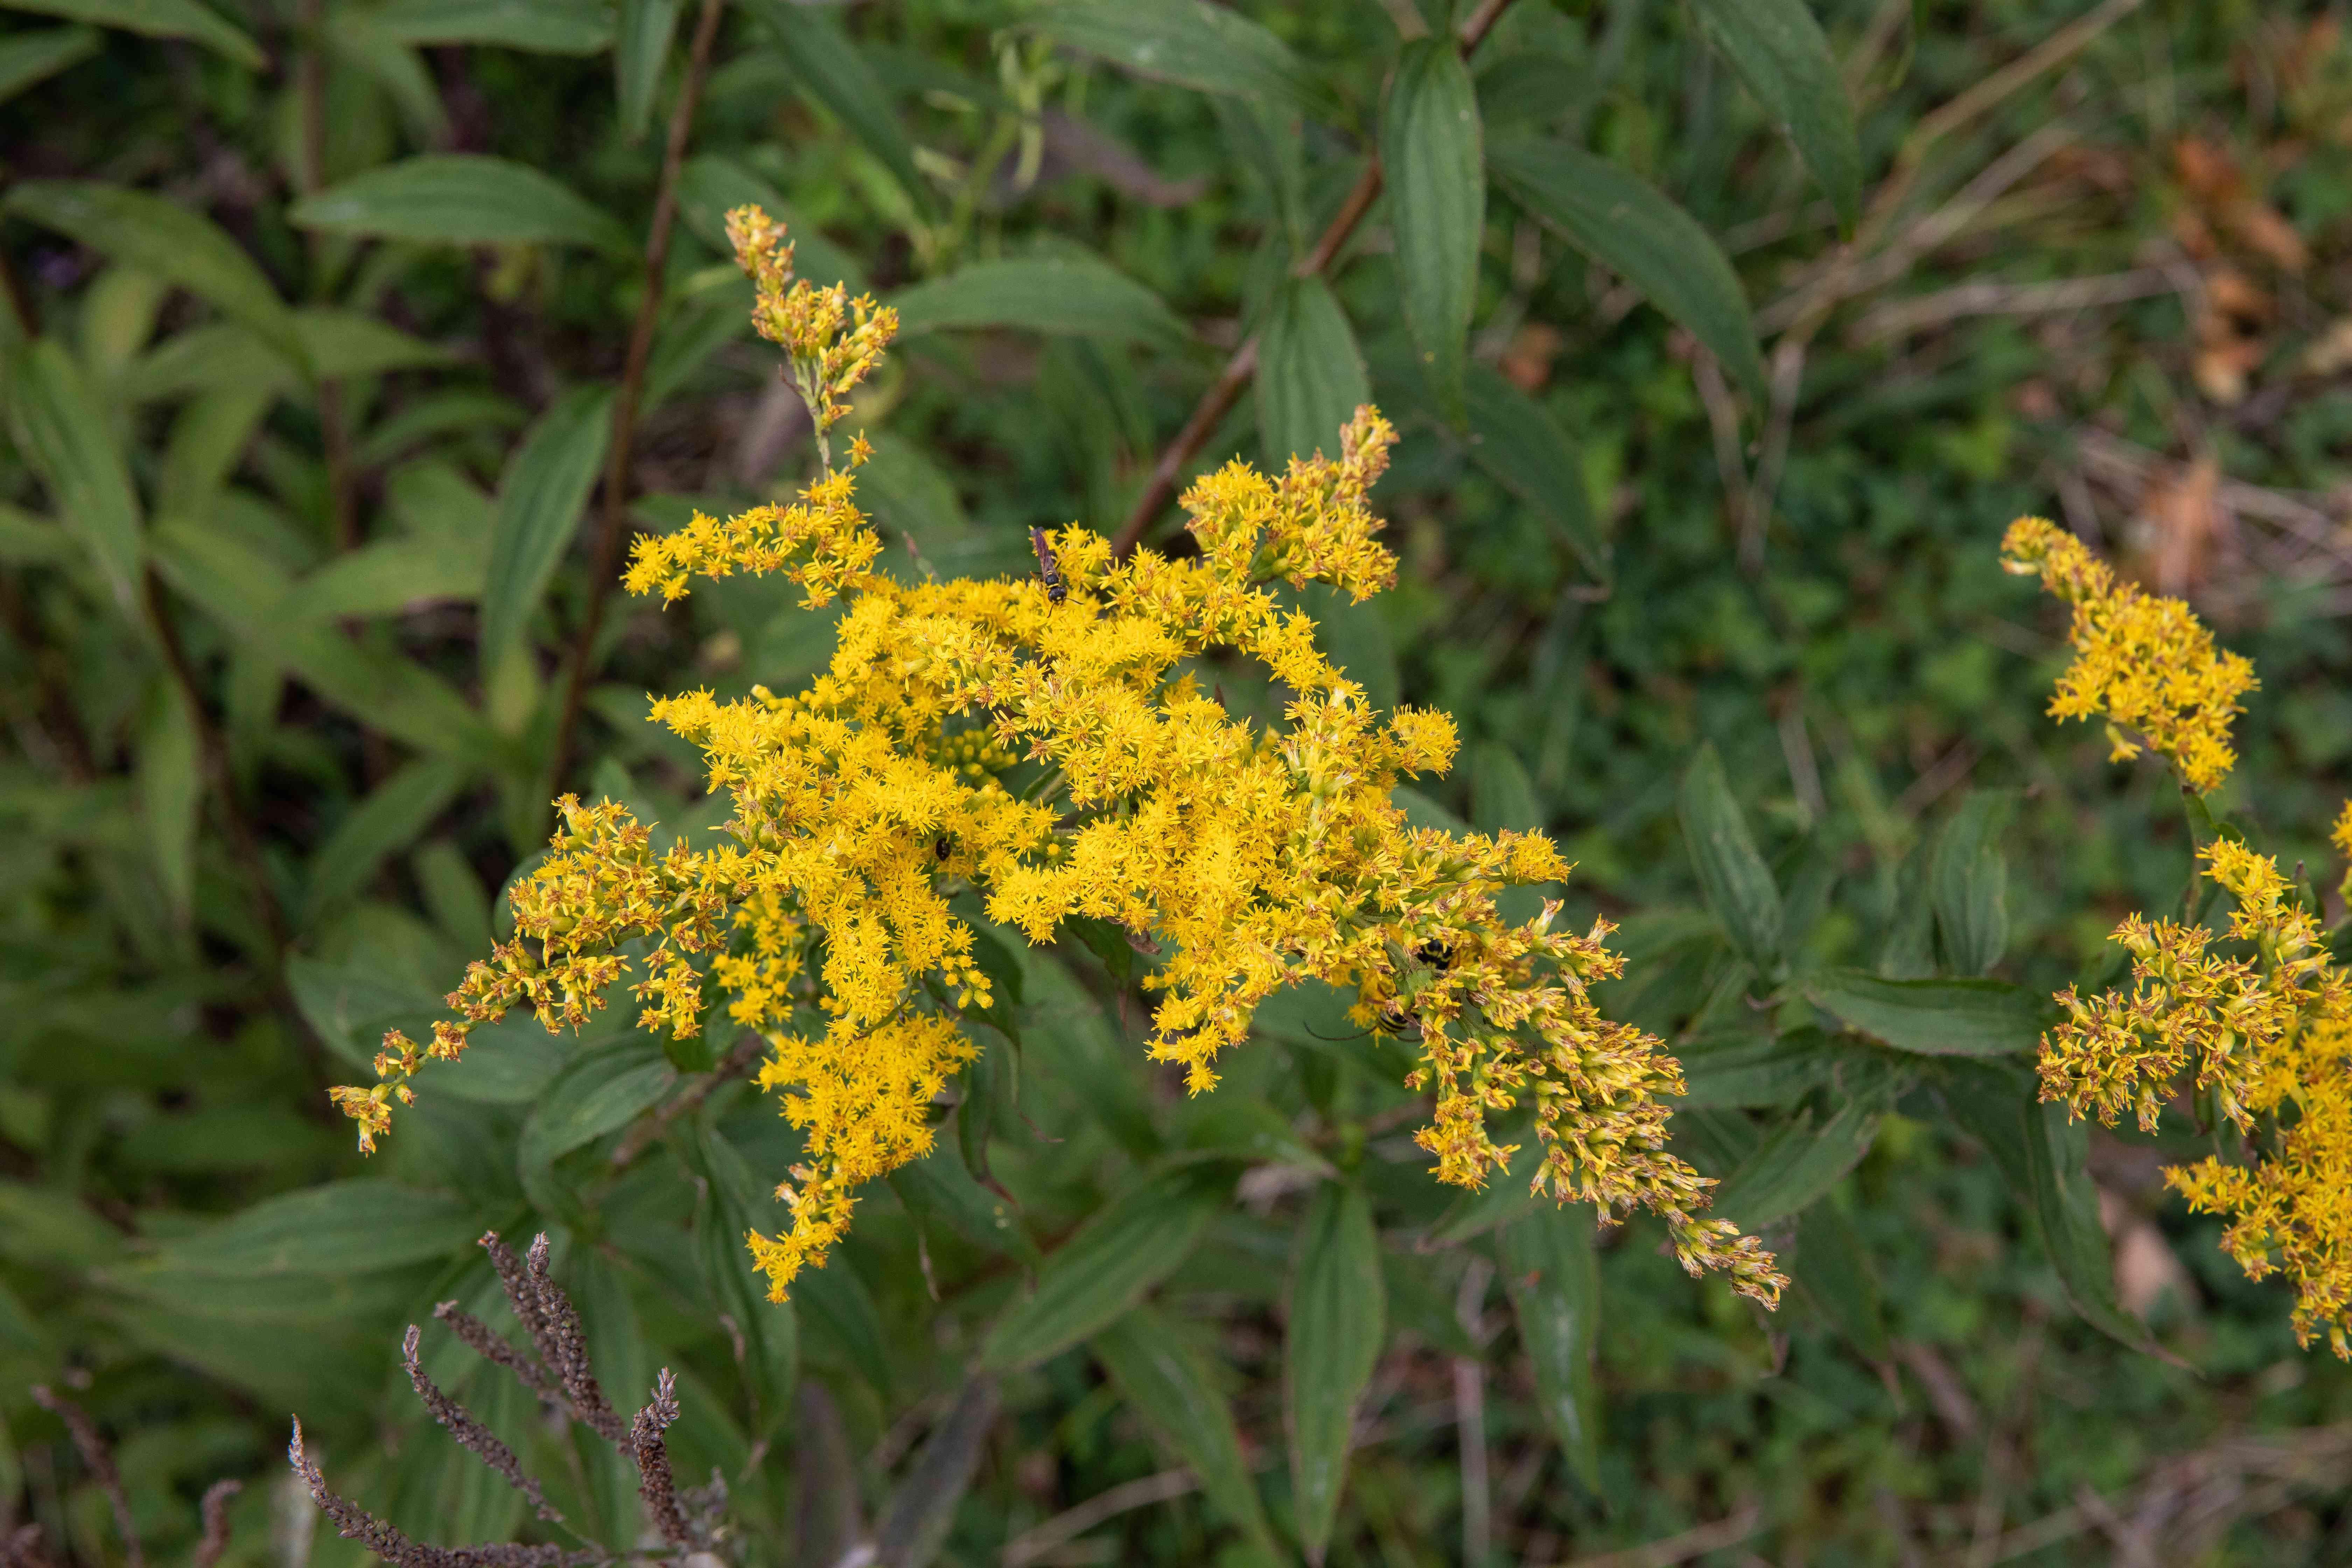 closeup of goldenrod